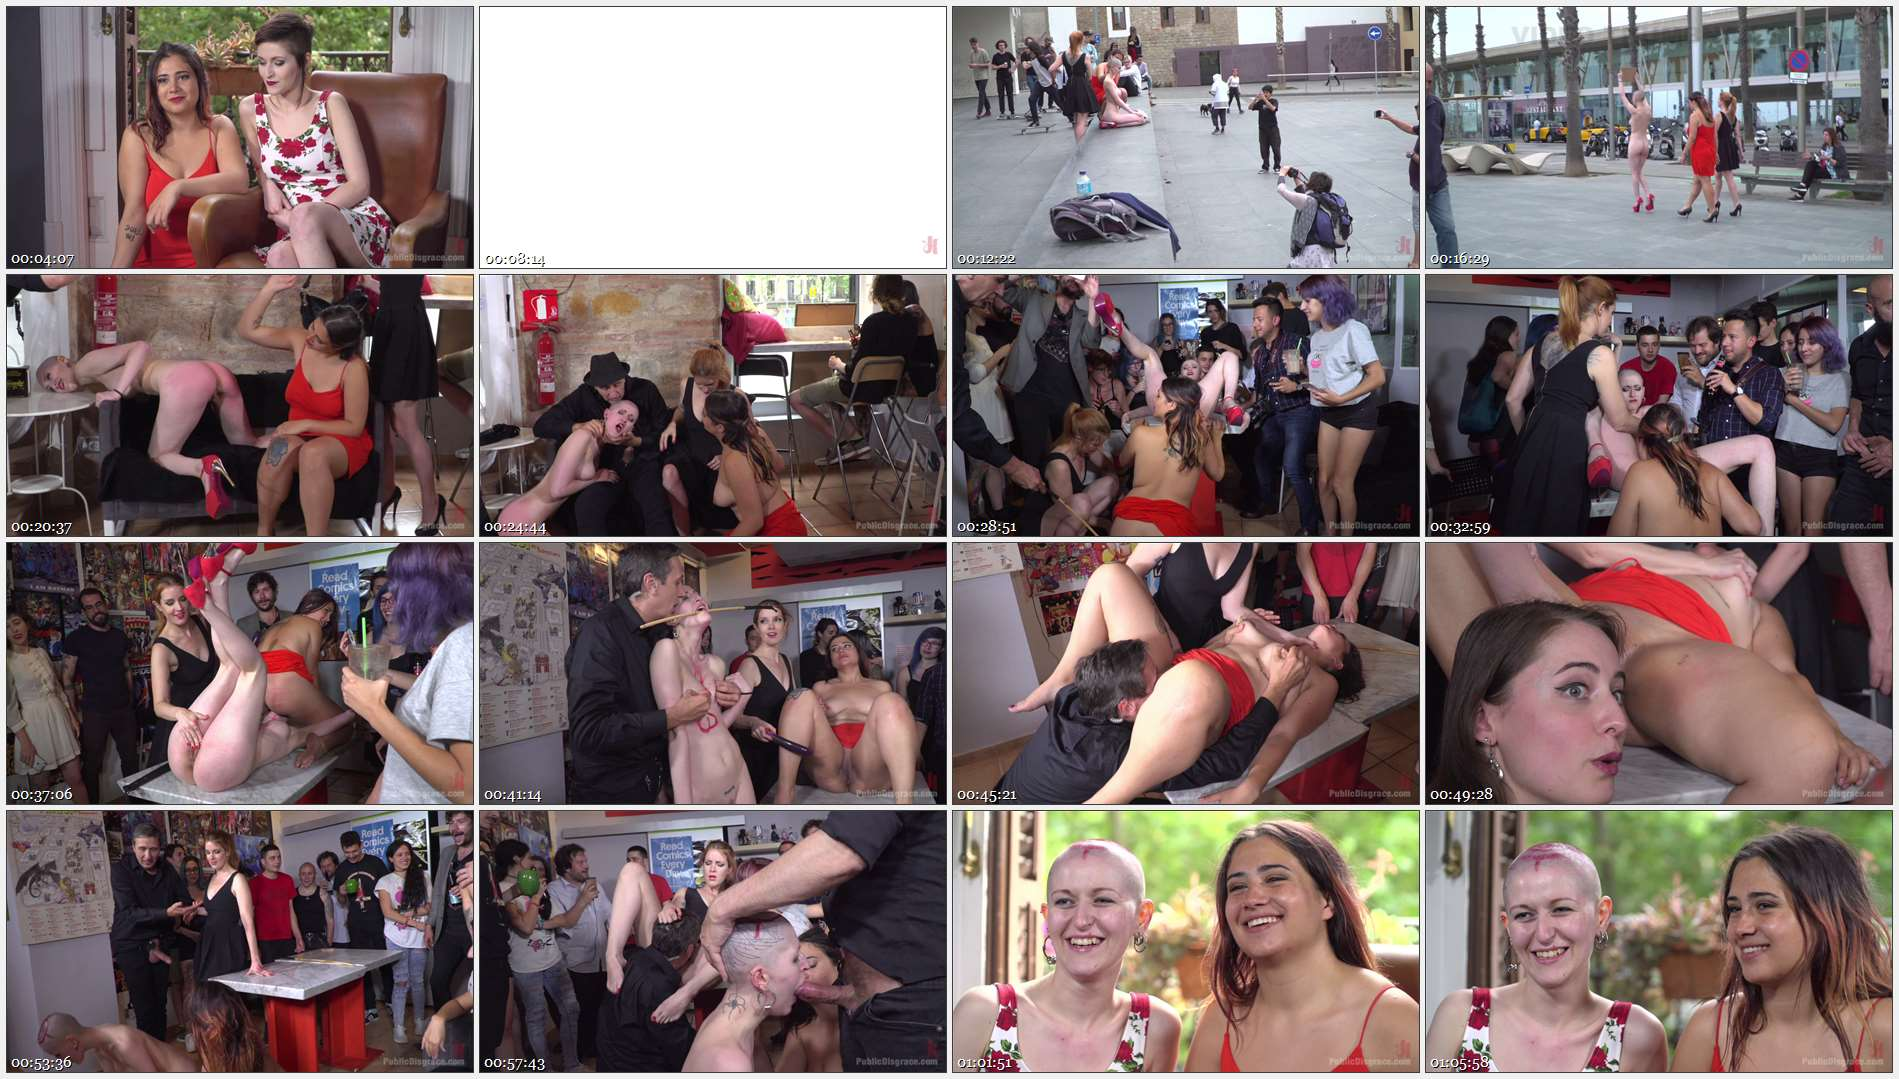 Steve Holmes – Irina Vega – Max Cortes – Nerea Falco – Lady Nala – Petite Slut Nerea Falco Shaves Head and Gets Gang Fucked in Public!